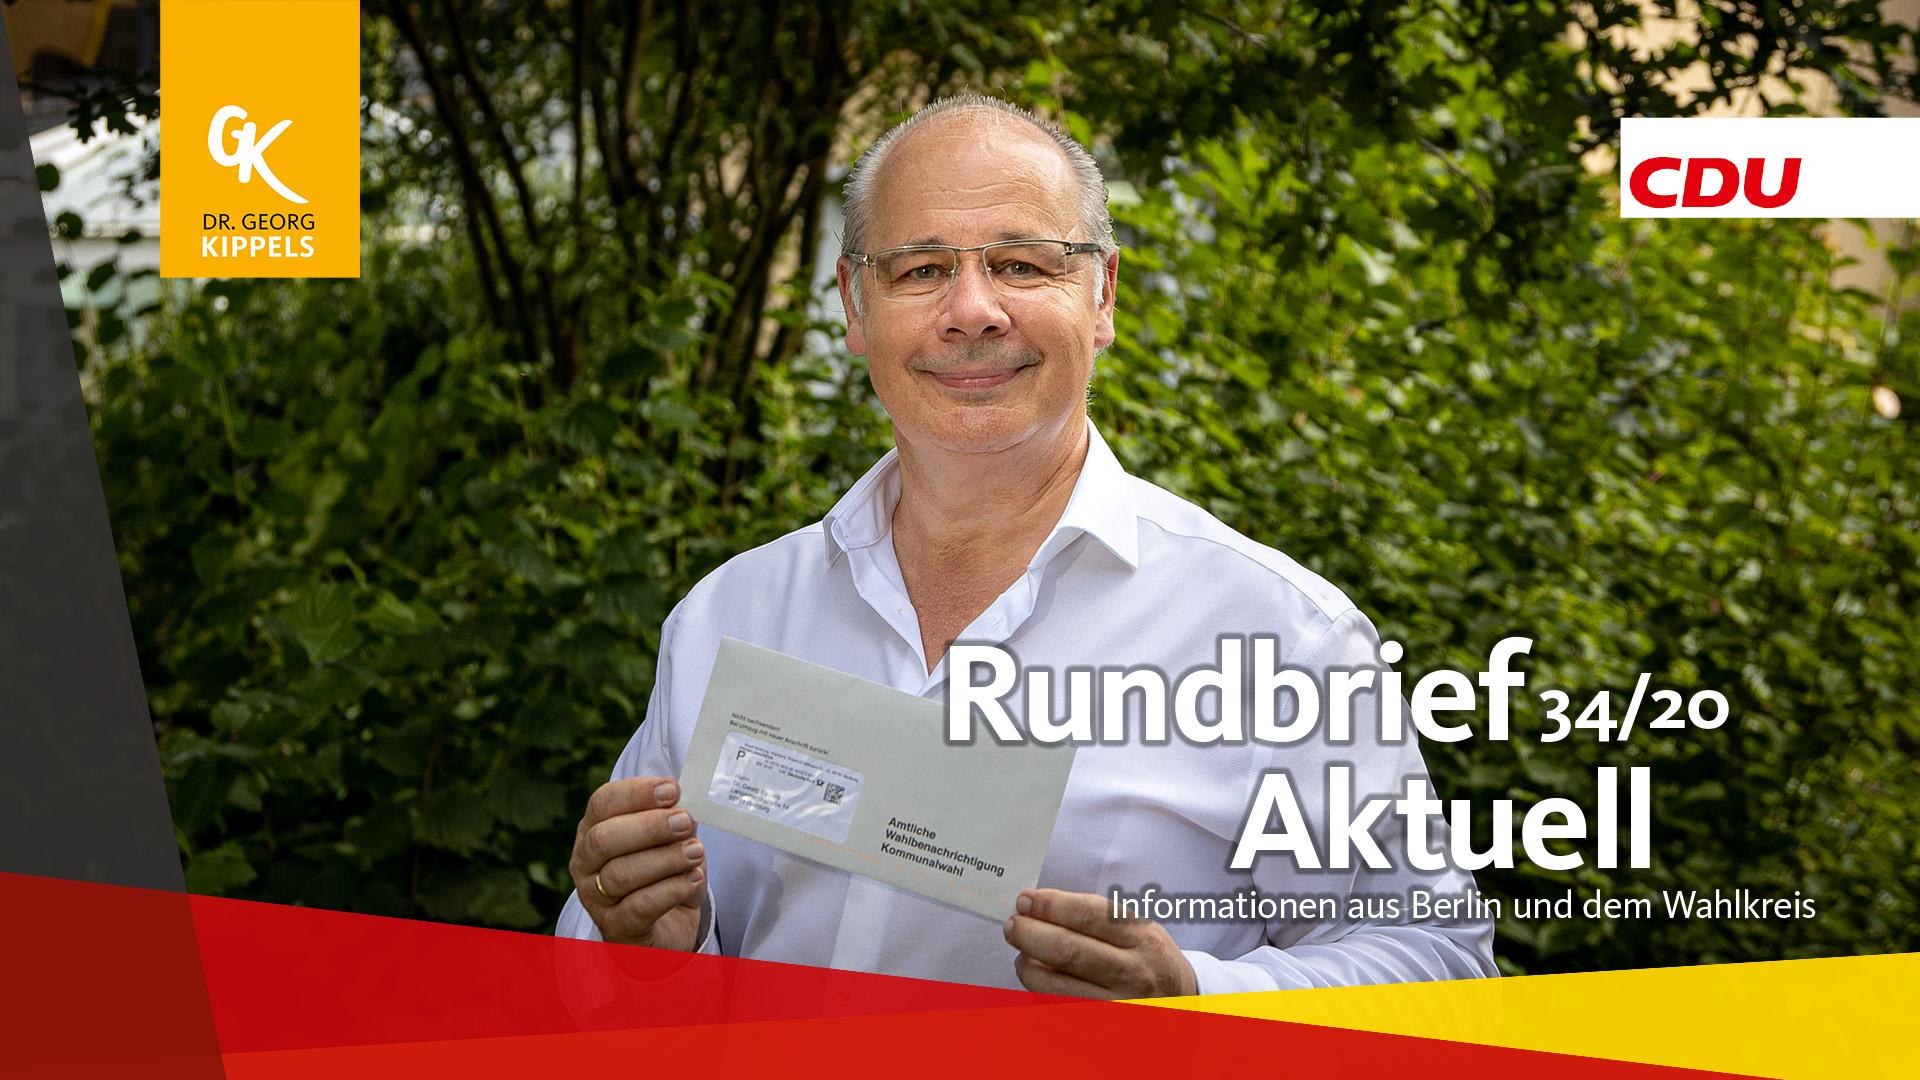 20kw34_HEAD-Rundbrief